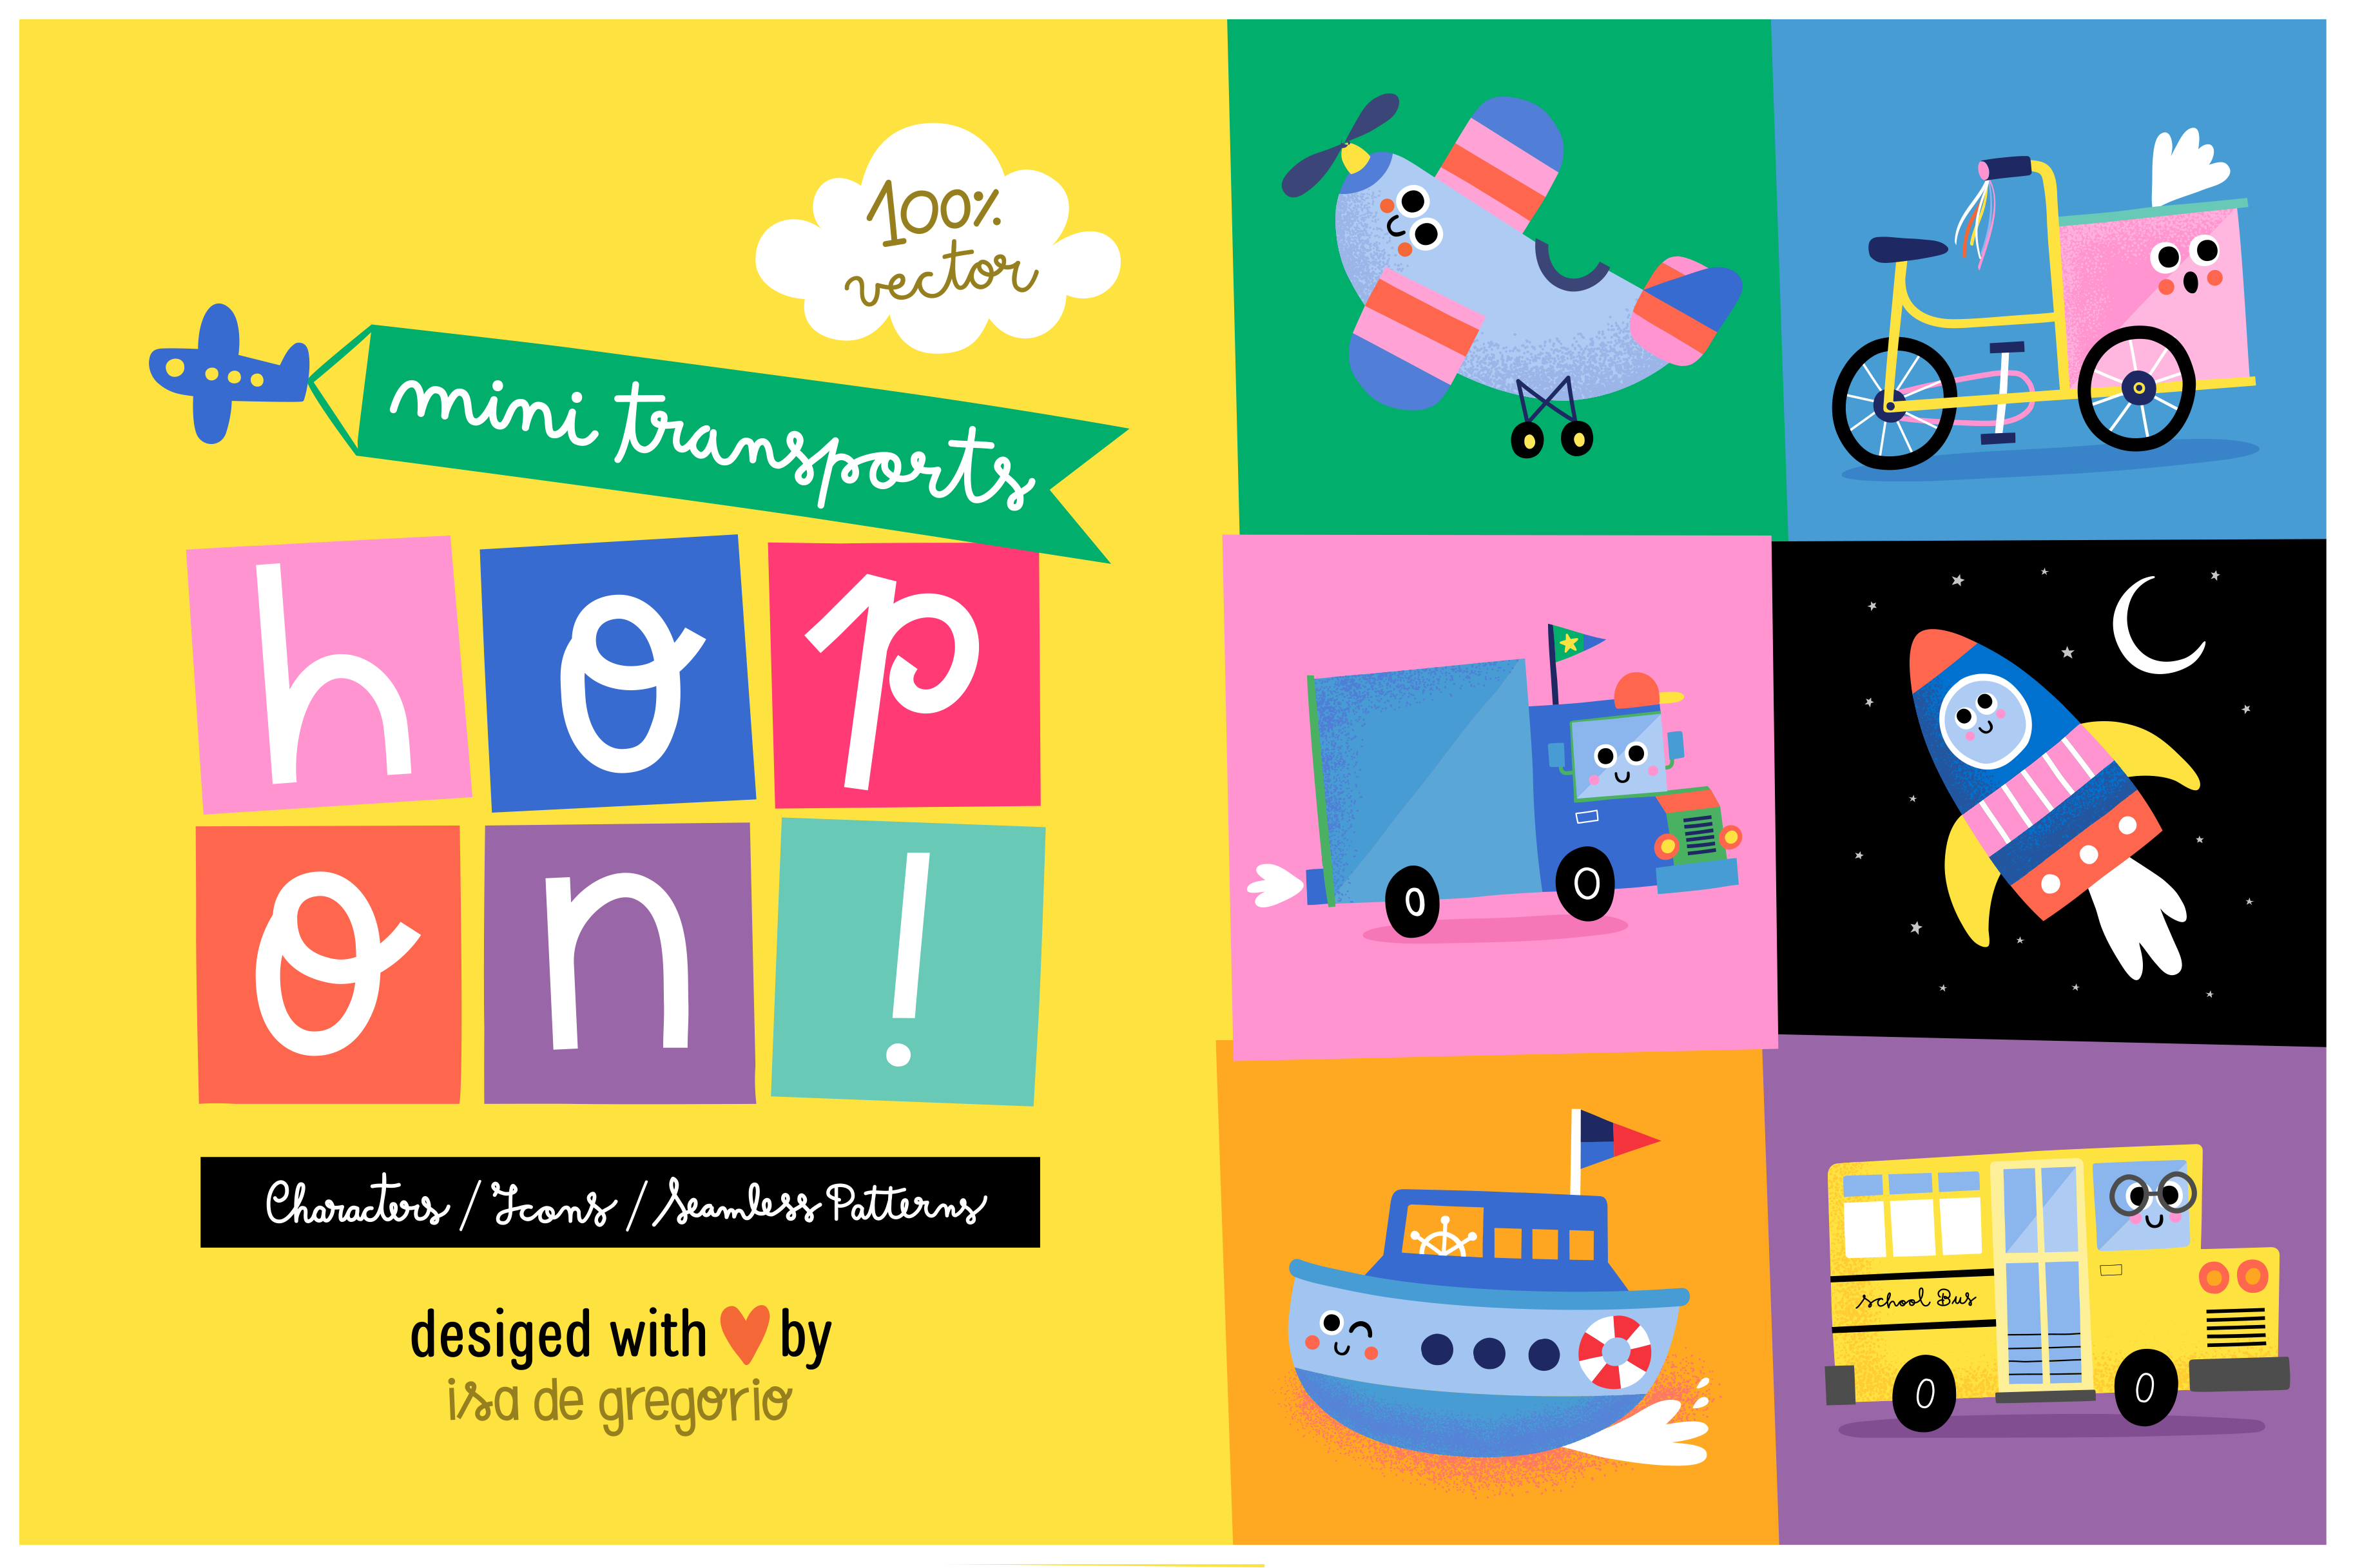 Hop On. Cute Mini Transports